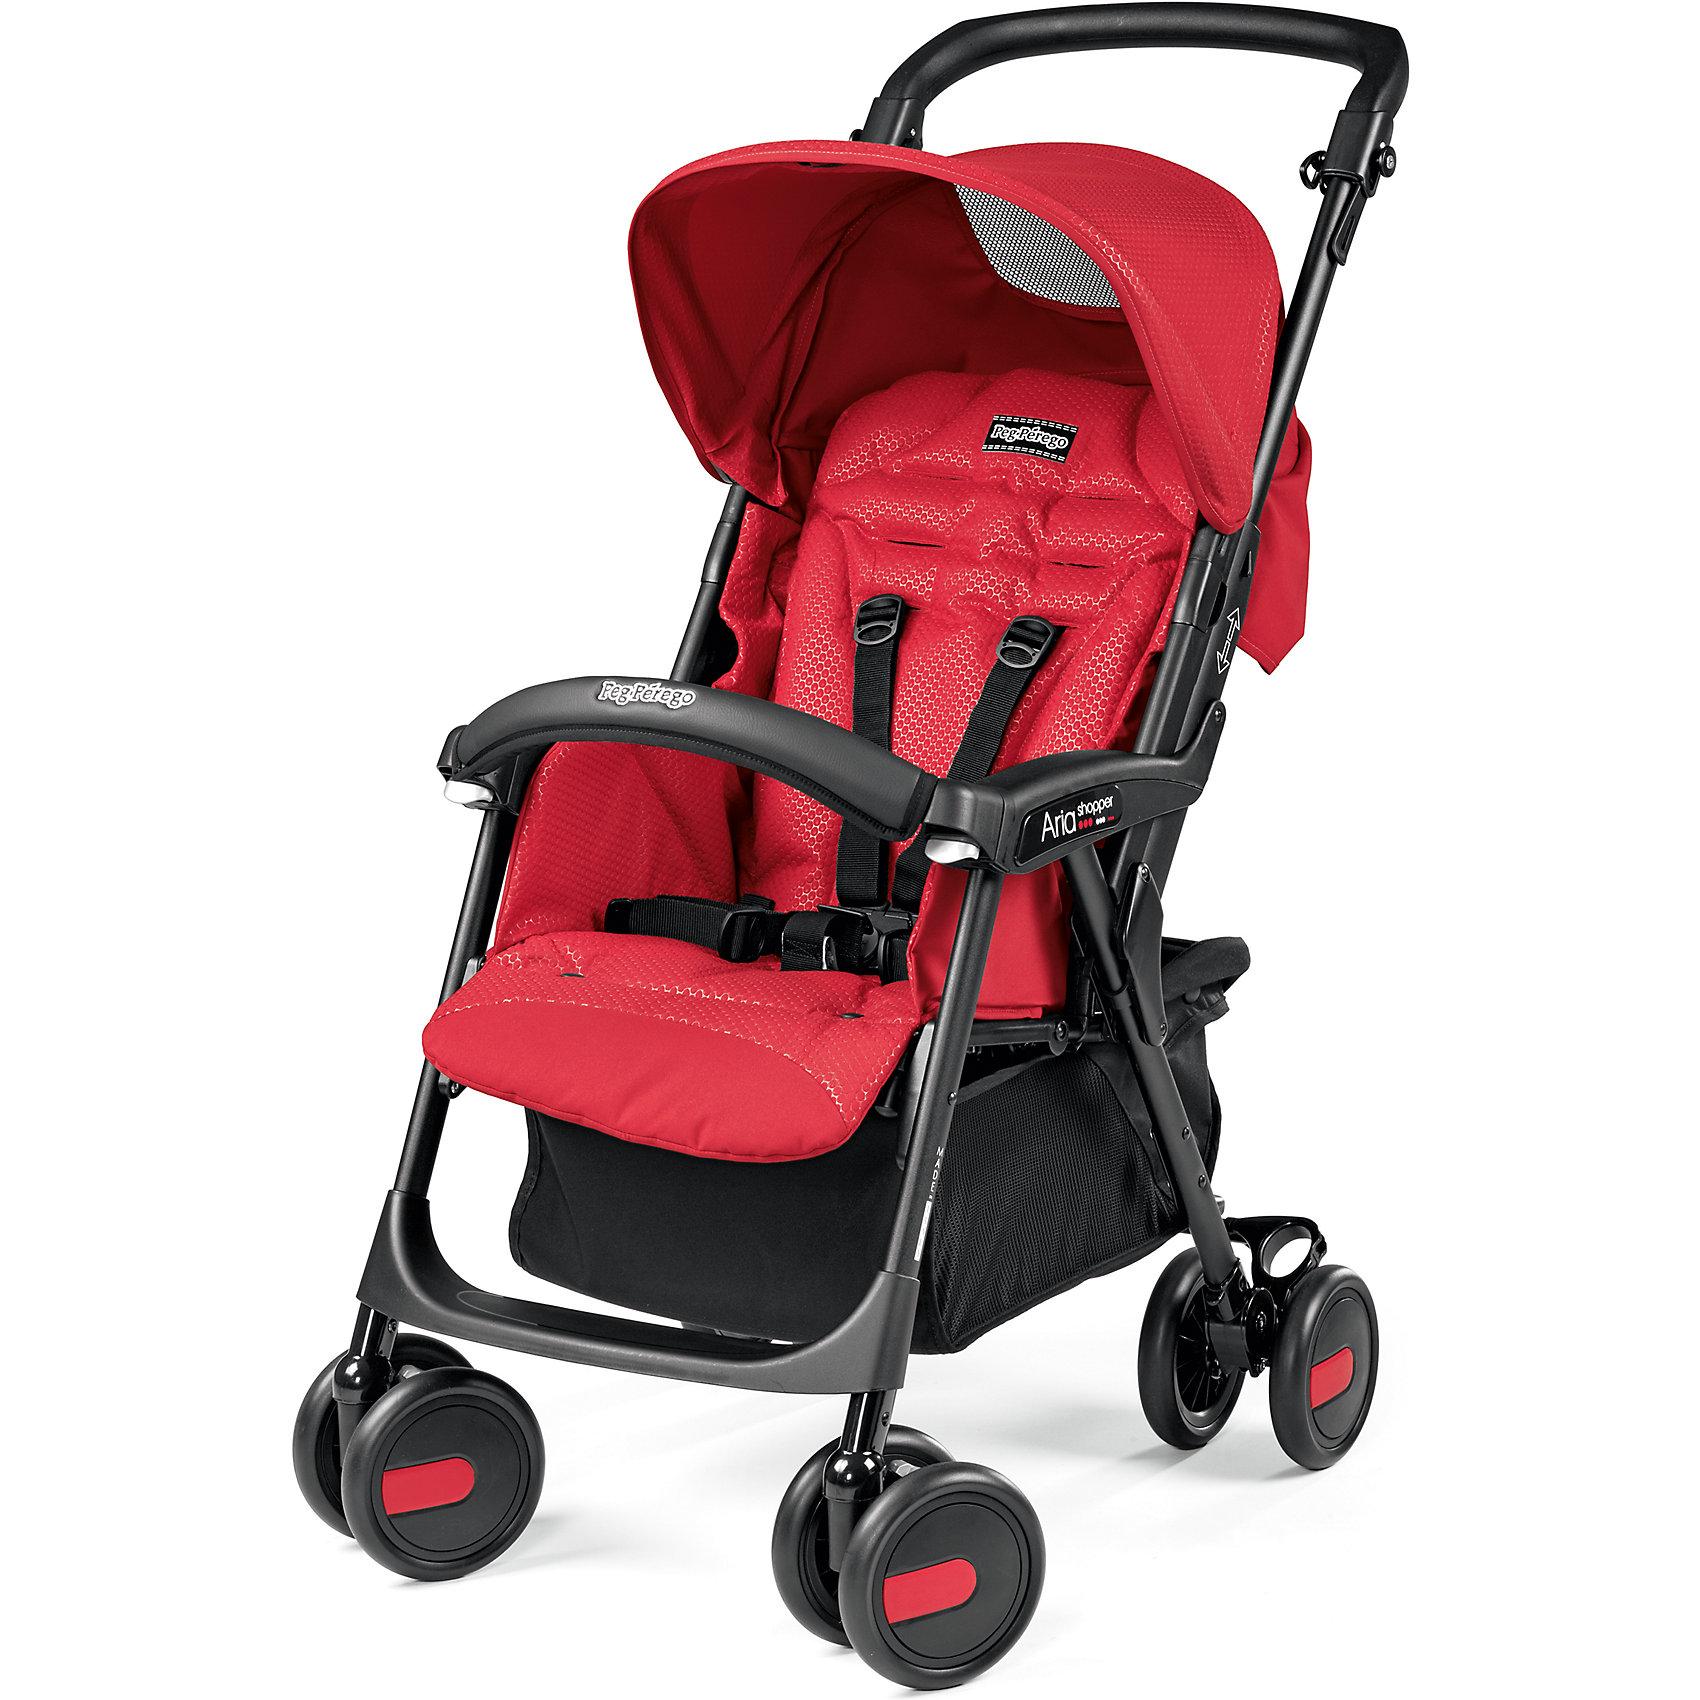 Прогулочная коляска Peg-Perego Aria Shopper, Mod RedПрогулочные коляски<br>Коляска детская прогулочная Aria Shopper цвет Mod Red, Peg-Perego (10130010/131216/0031077/1, ИТАЛИЯ)<br><br>Ширина мм: 465<br>Глубина мм: 240<br>Высота мм: 775<br>Вес г: 8700<br>Возраст от месяцев: 6<br>Возраст до месяцев: 36<br>Пол: Унисекс<br>Возраст: Детский<br>SKU: 5489971